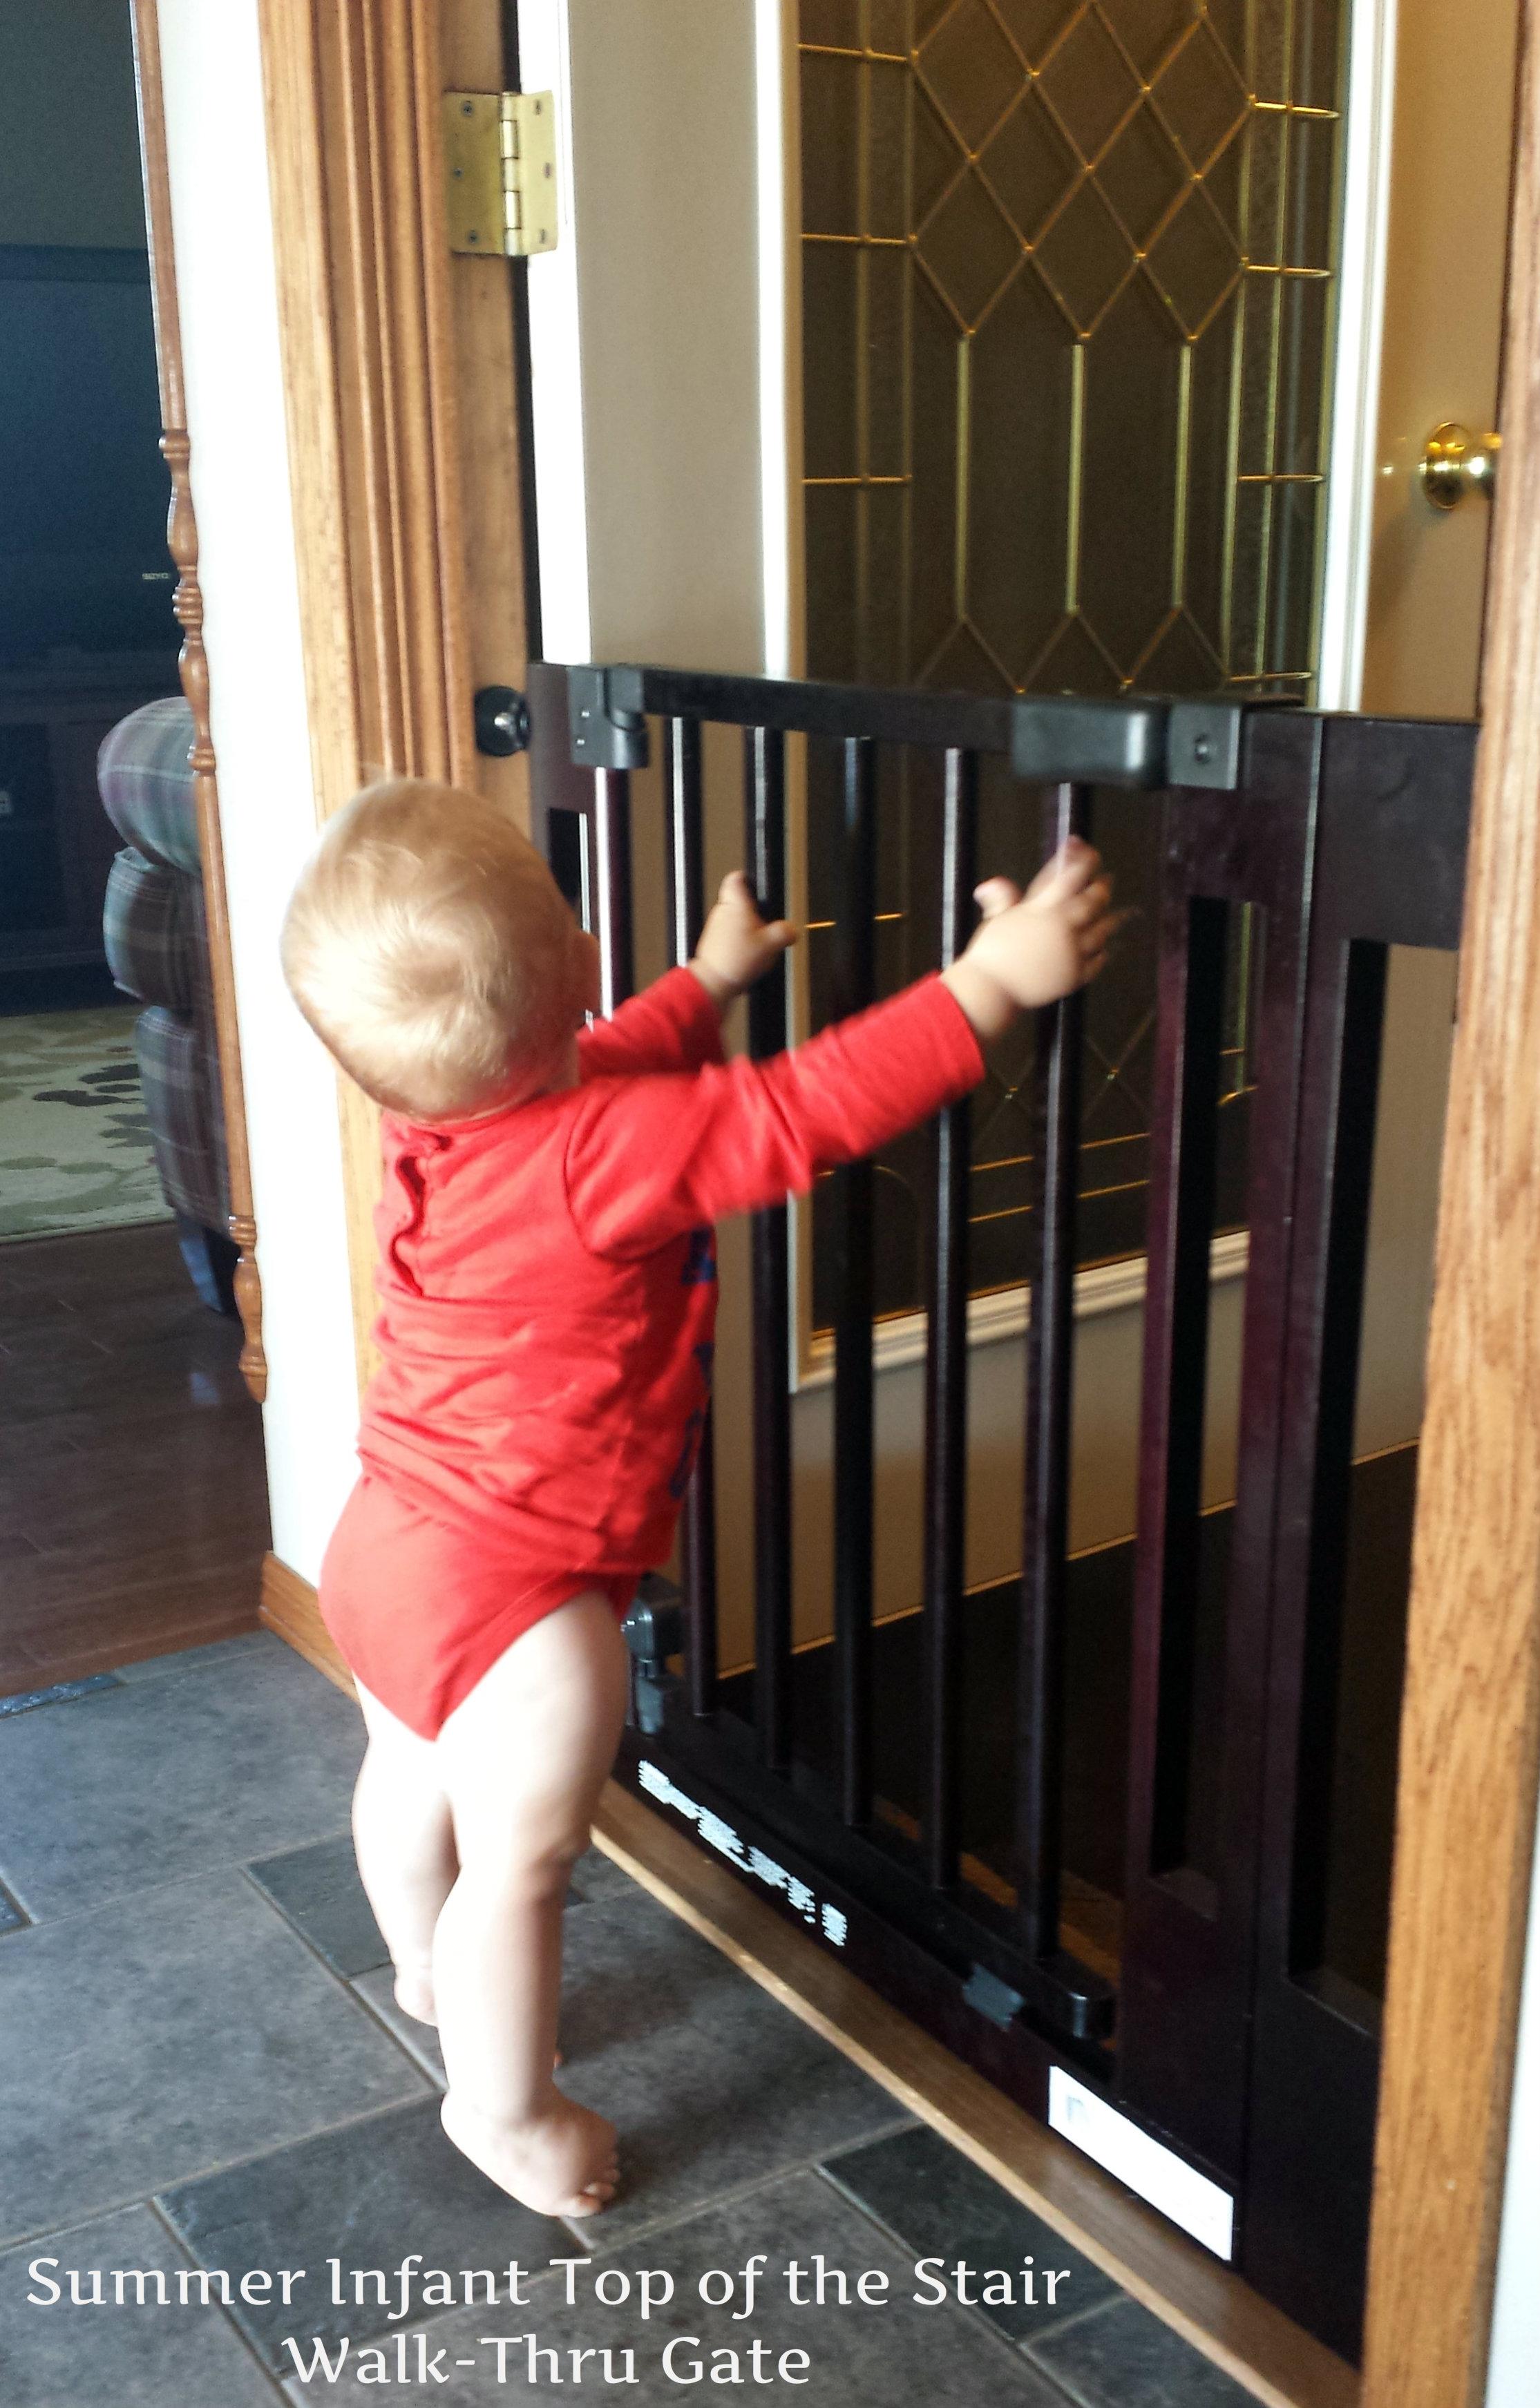 secure top of the stairs walkthru baby gate  momma in flip flops - gate disclosure